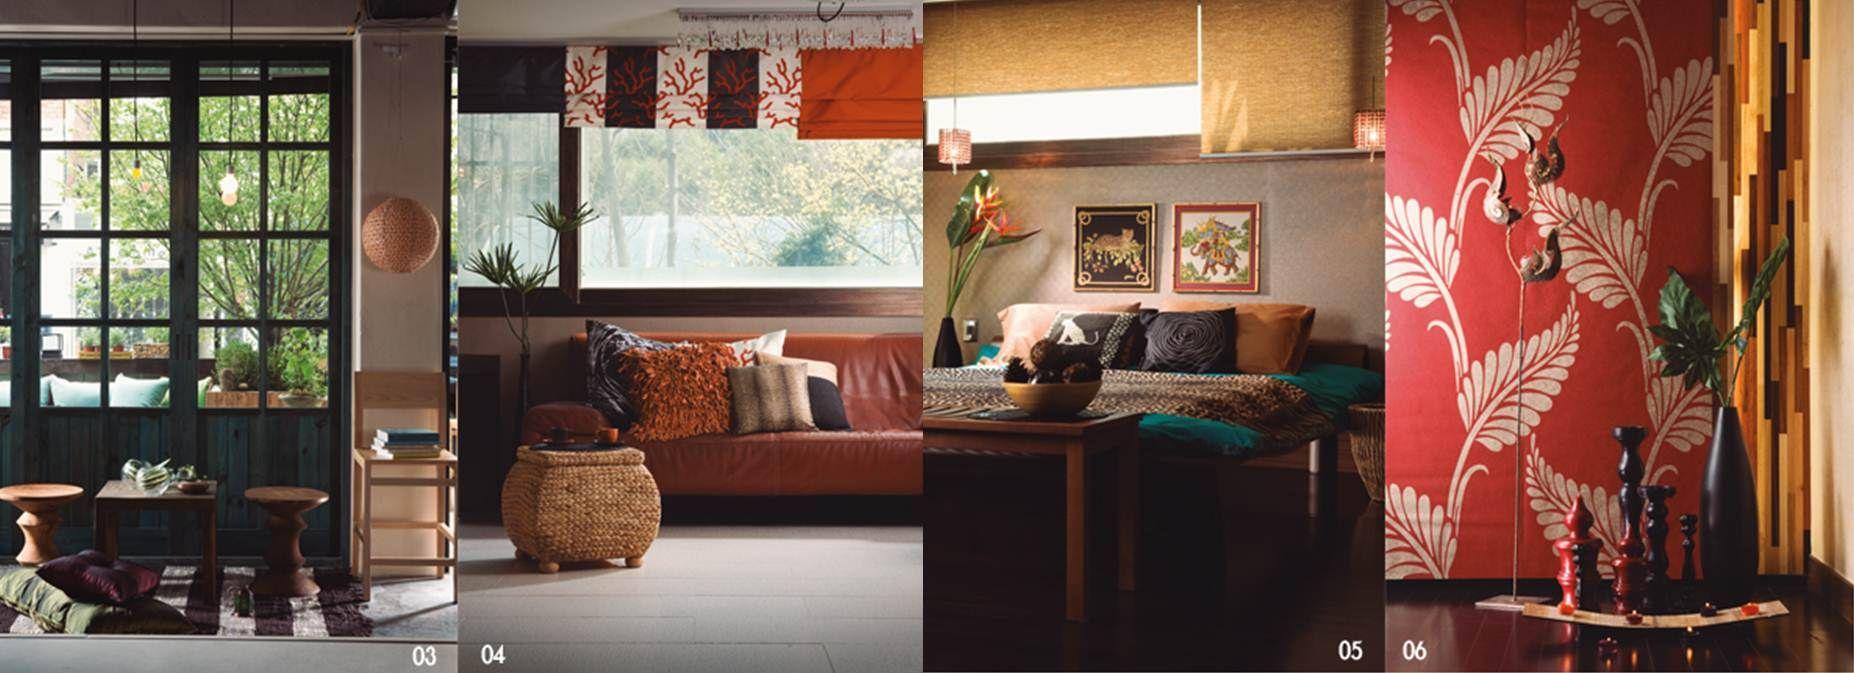 Asian Style Interior Design Ideas Decor Around The World Asian